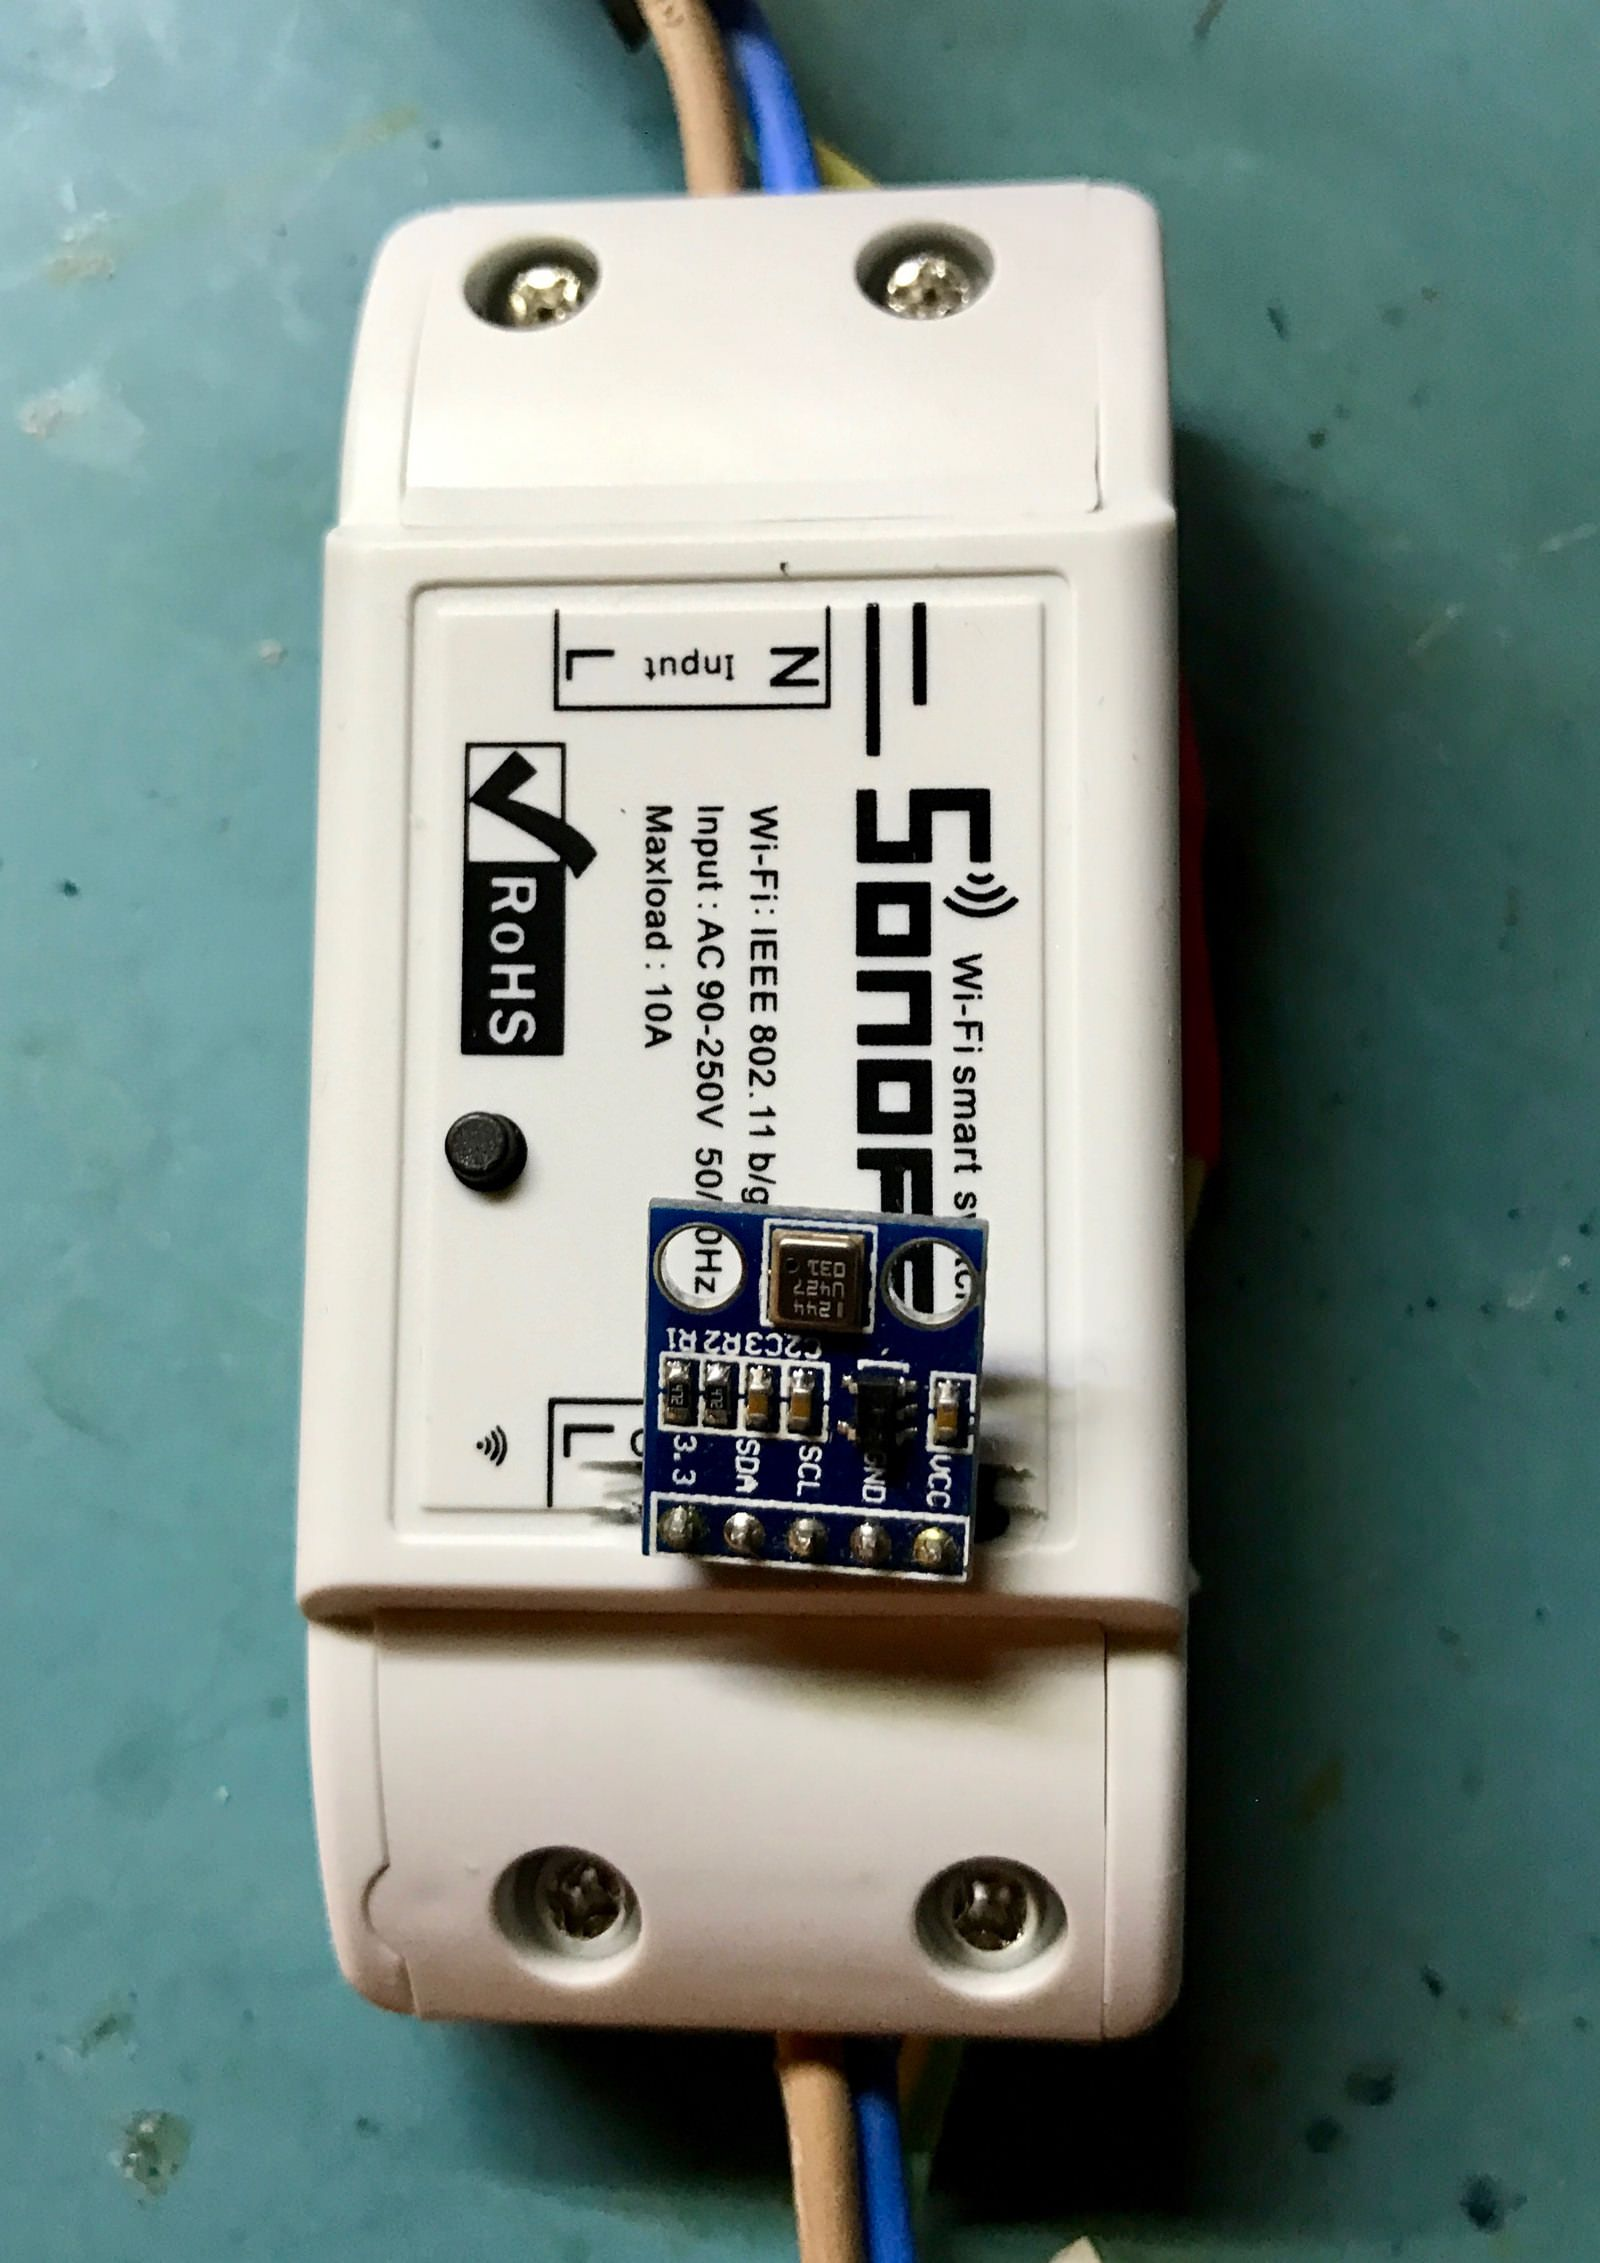 Sonoff WiFi Smart Switch With I2C Port – JackenHack | Home